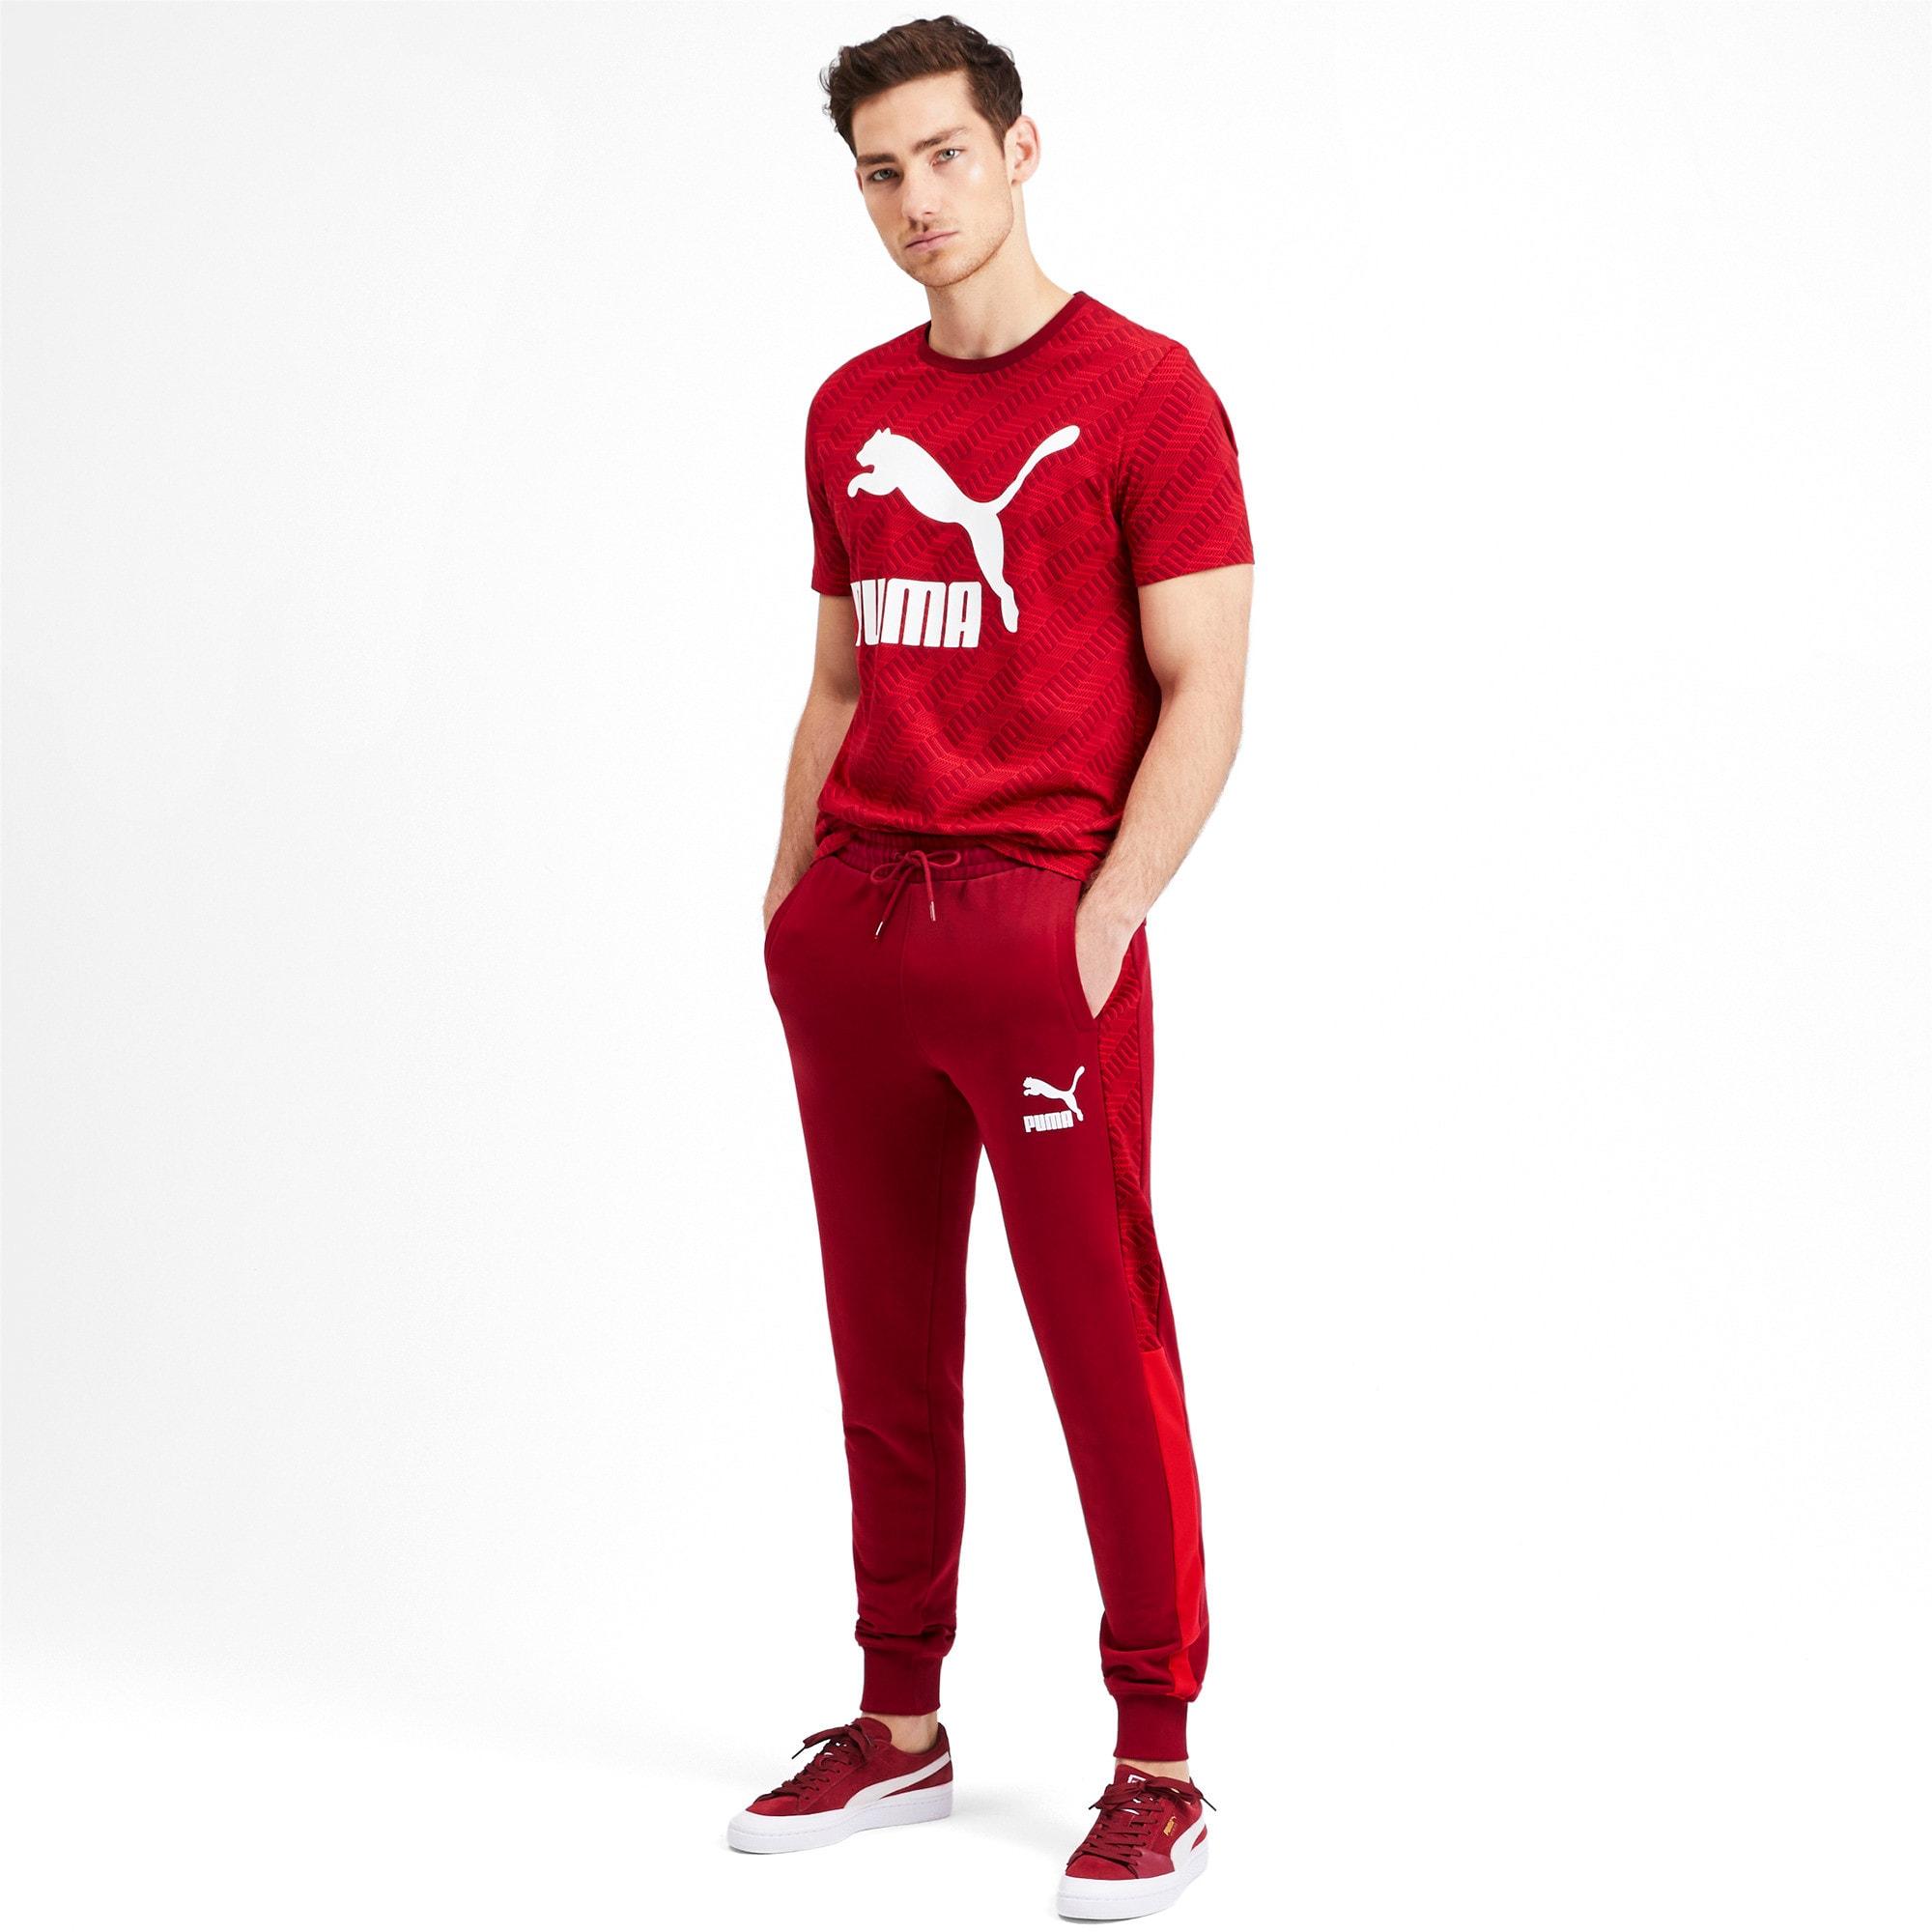 Thumbnail 4 of T7 Men's AOP Track Pants, Rhubarb-Repeat logo, medium